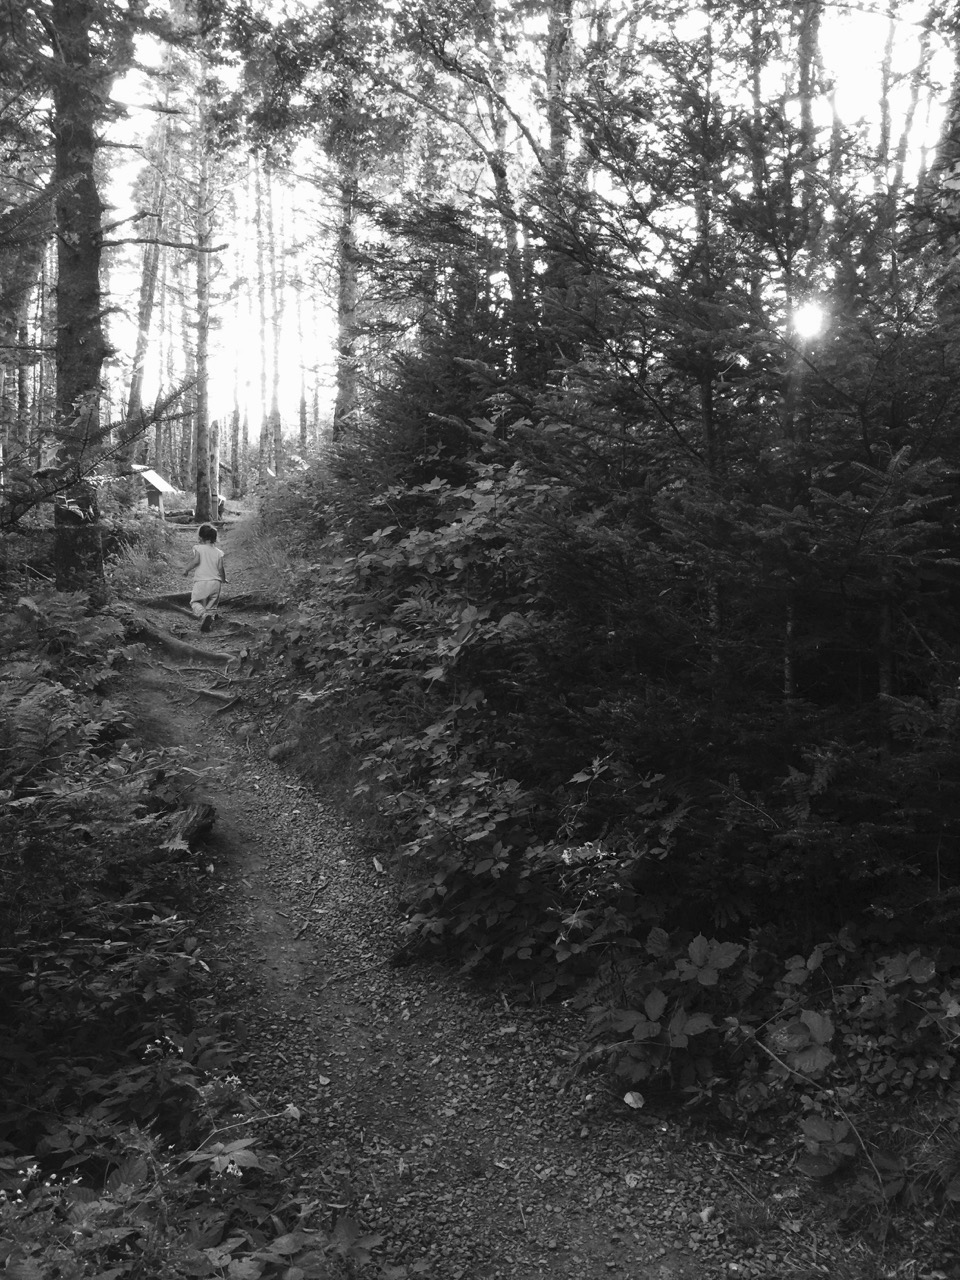 Hiking back up the Balancing Rock Trail.